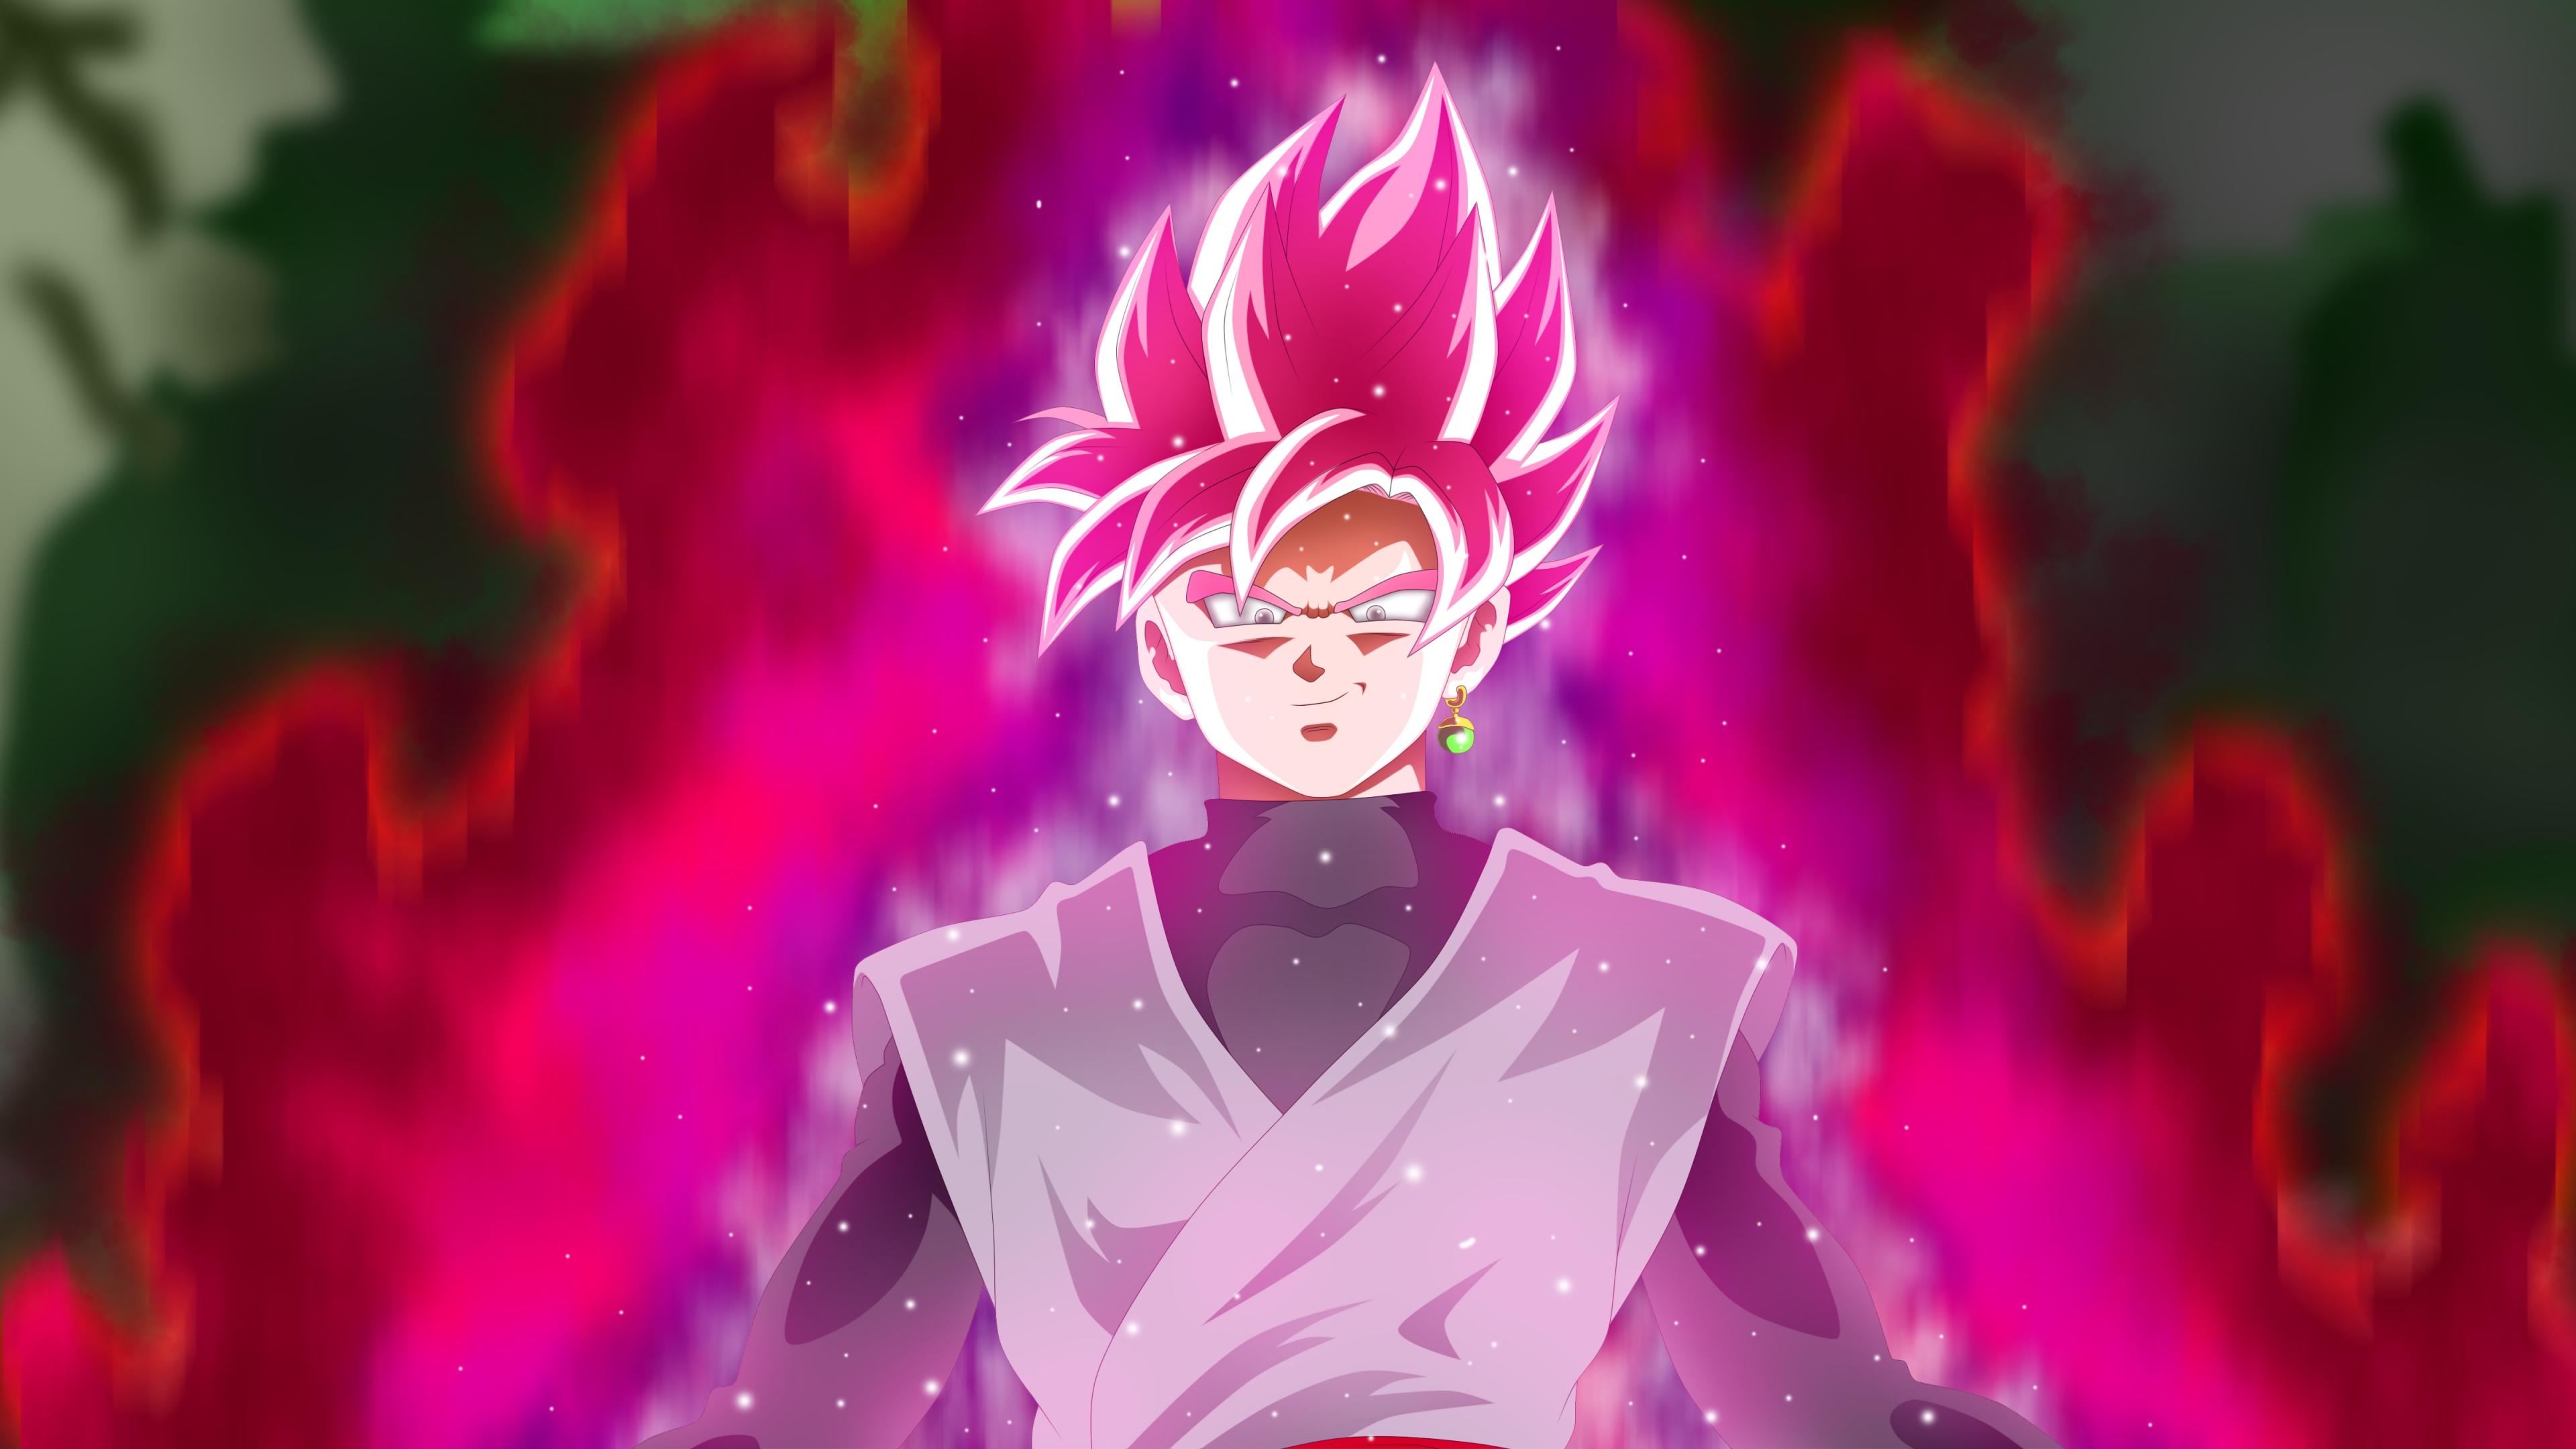 Desktop Wallpaper Black Goku Dragon Ball Super Anime Boy Hd Image Picture Background Skzien